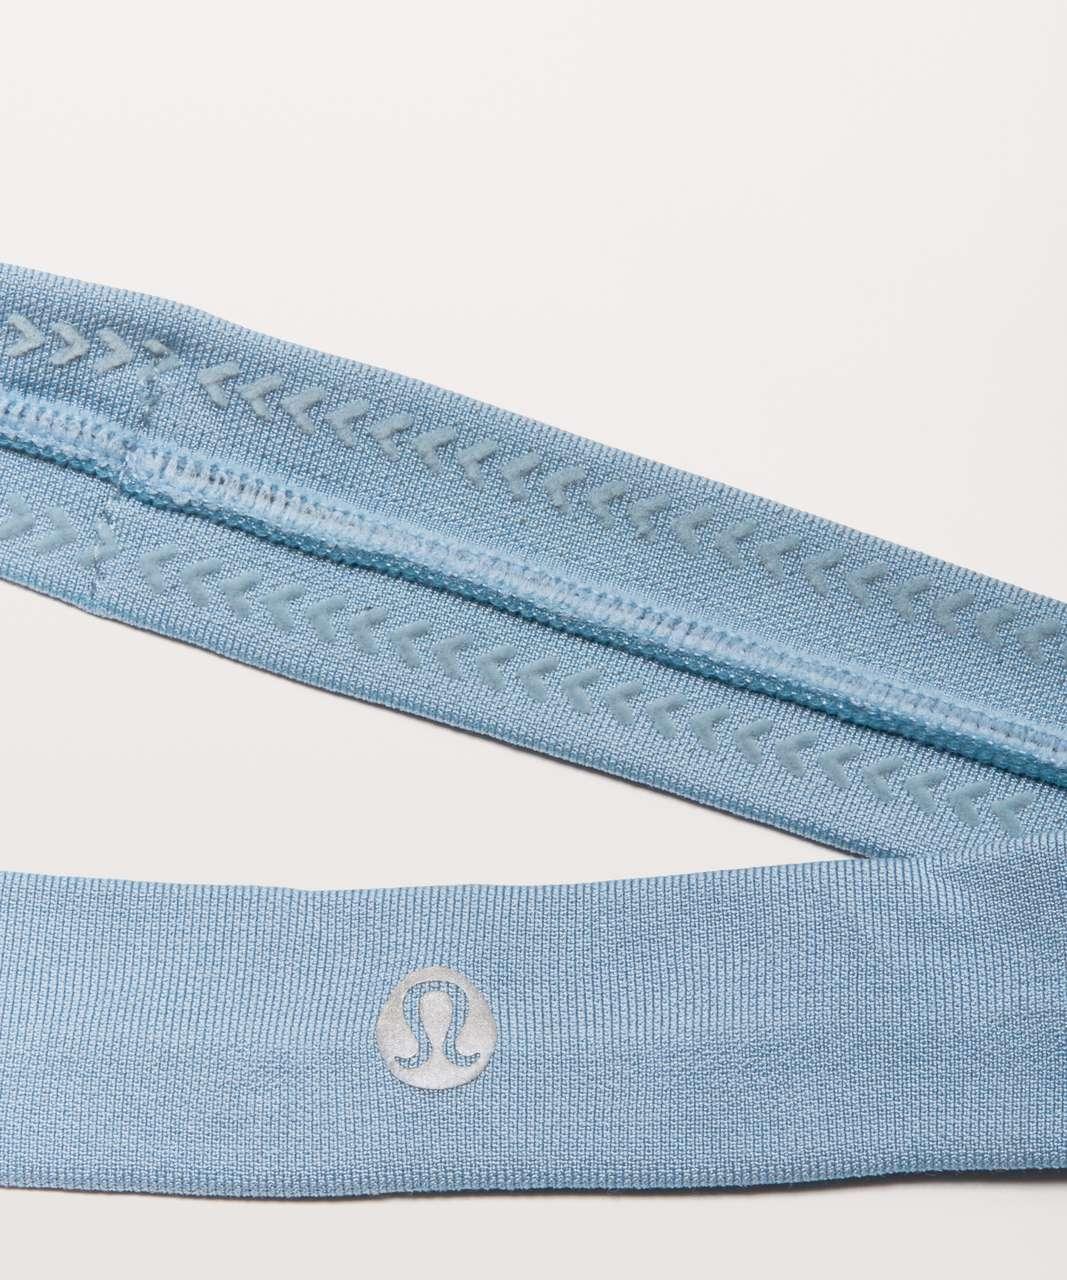 Lululemon Cardio Cross Trainer Headband - Cascade Blue / Cascade Blue